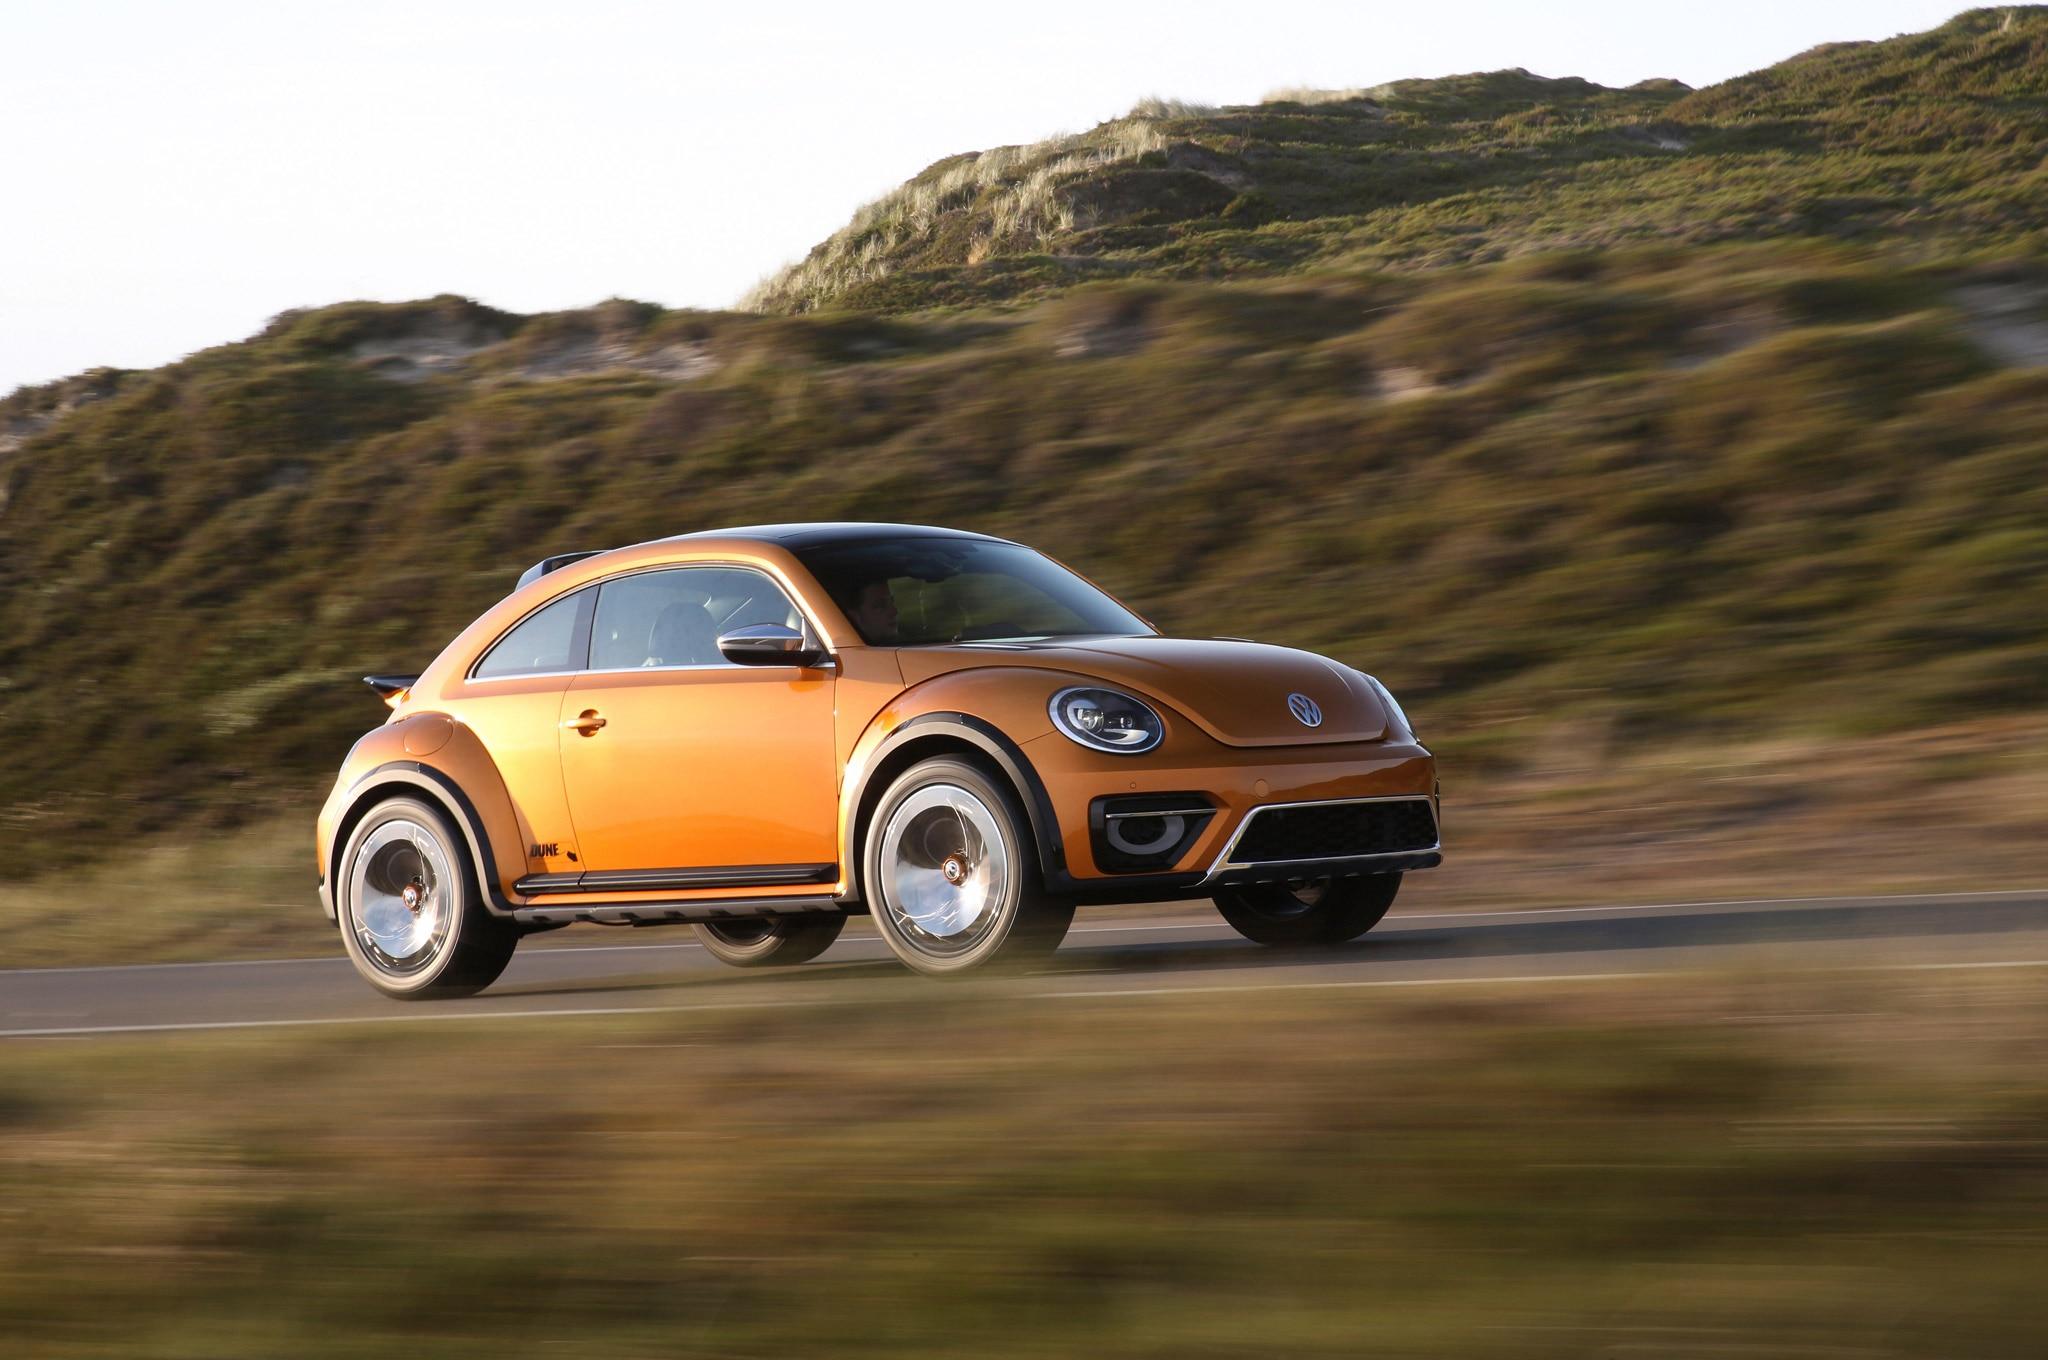 Volkswagen Beetle Dune Confirmed For Production - Automobile